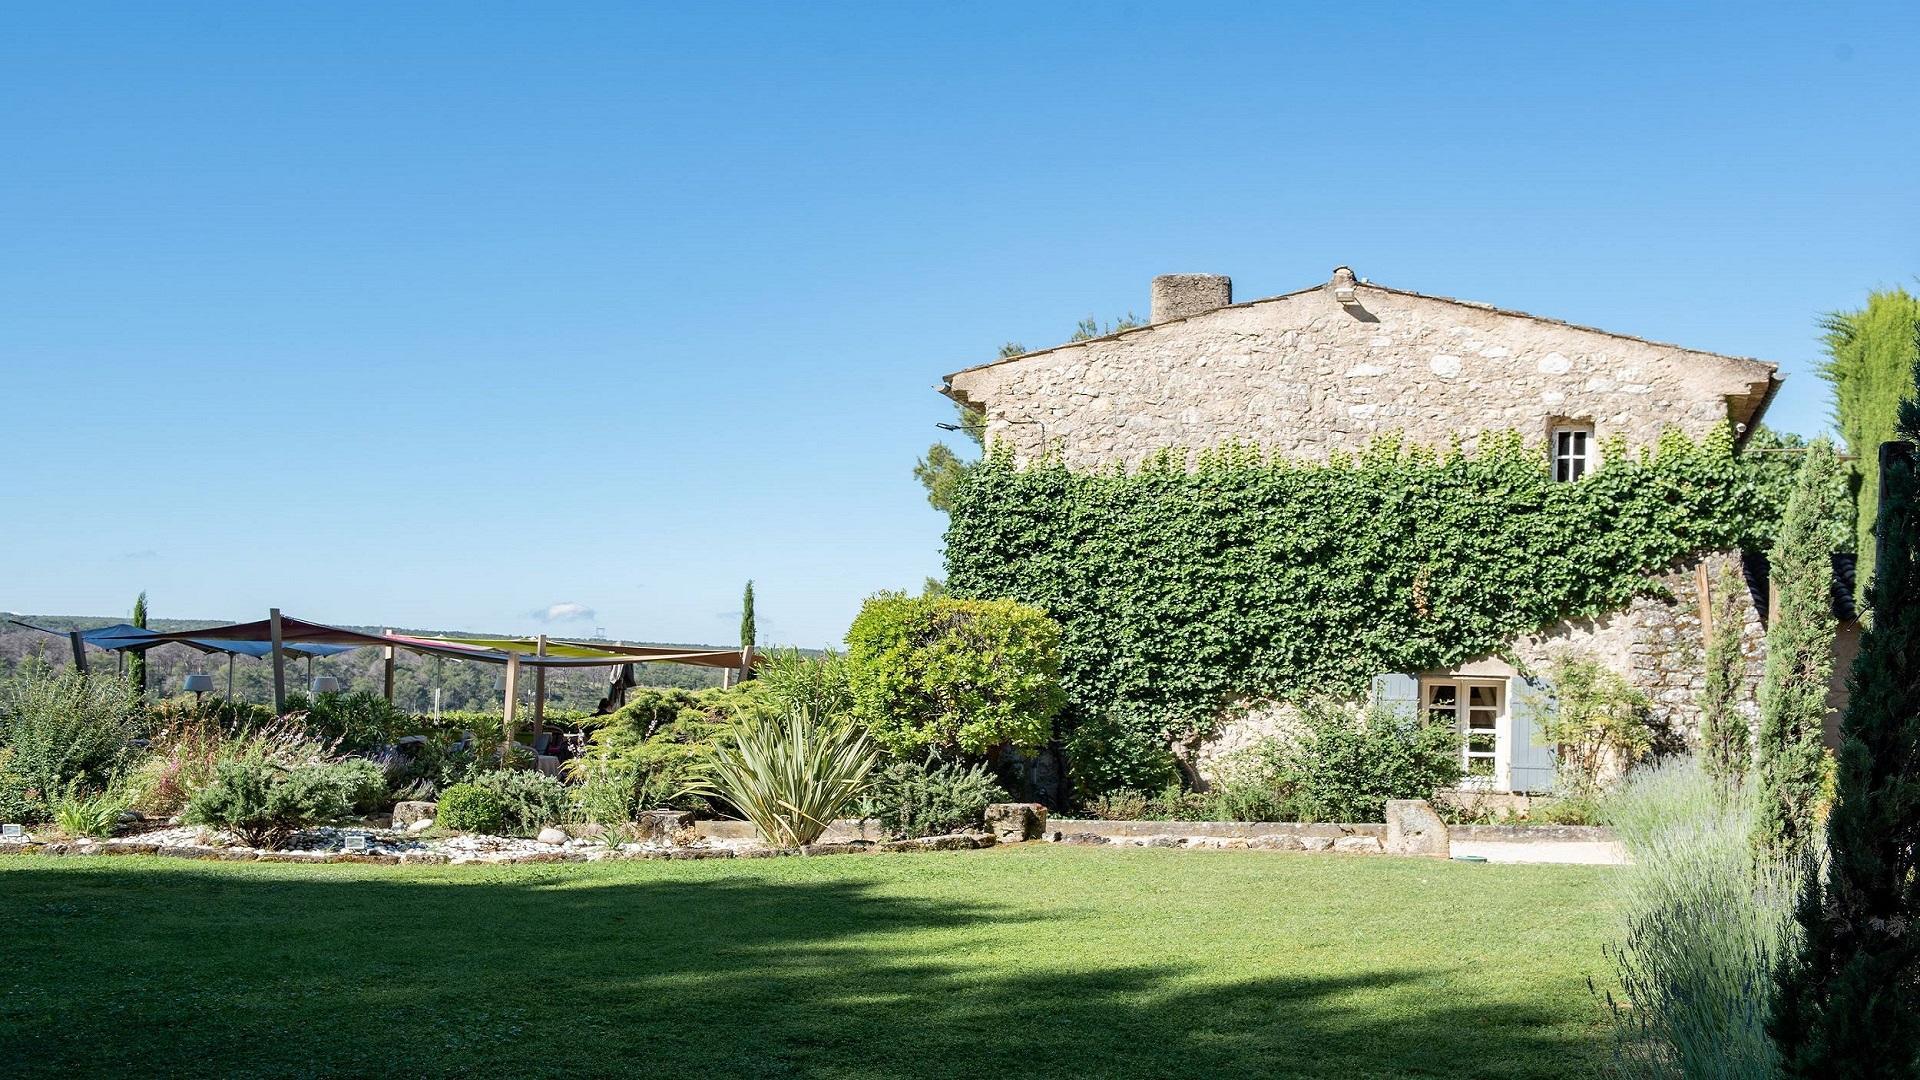 le-mas-de-fauchon-aix-en-provence-luberon-jardins-seminaires-de-caractere